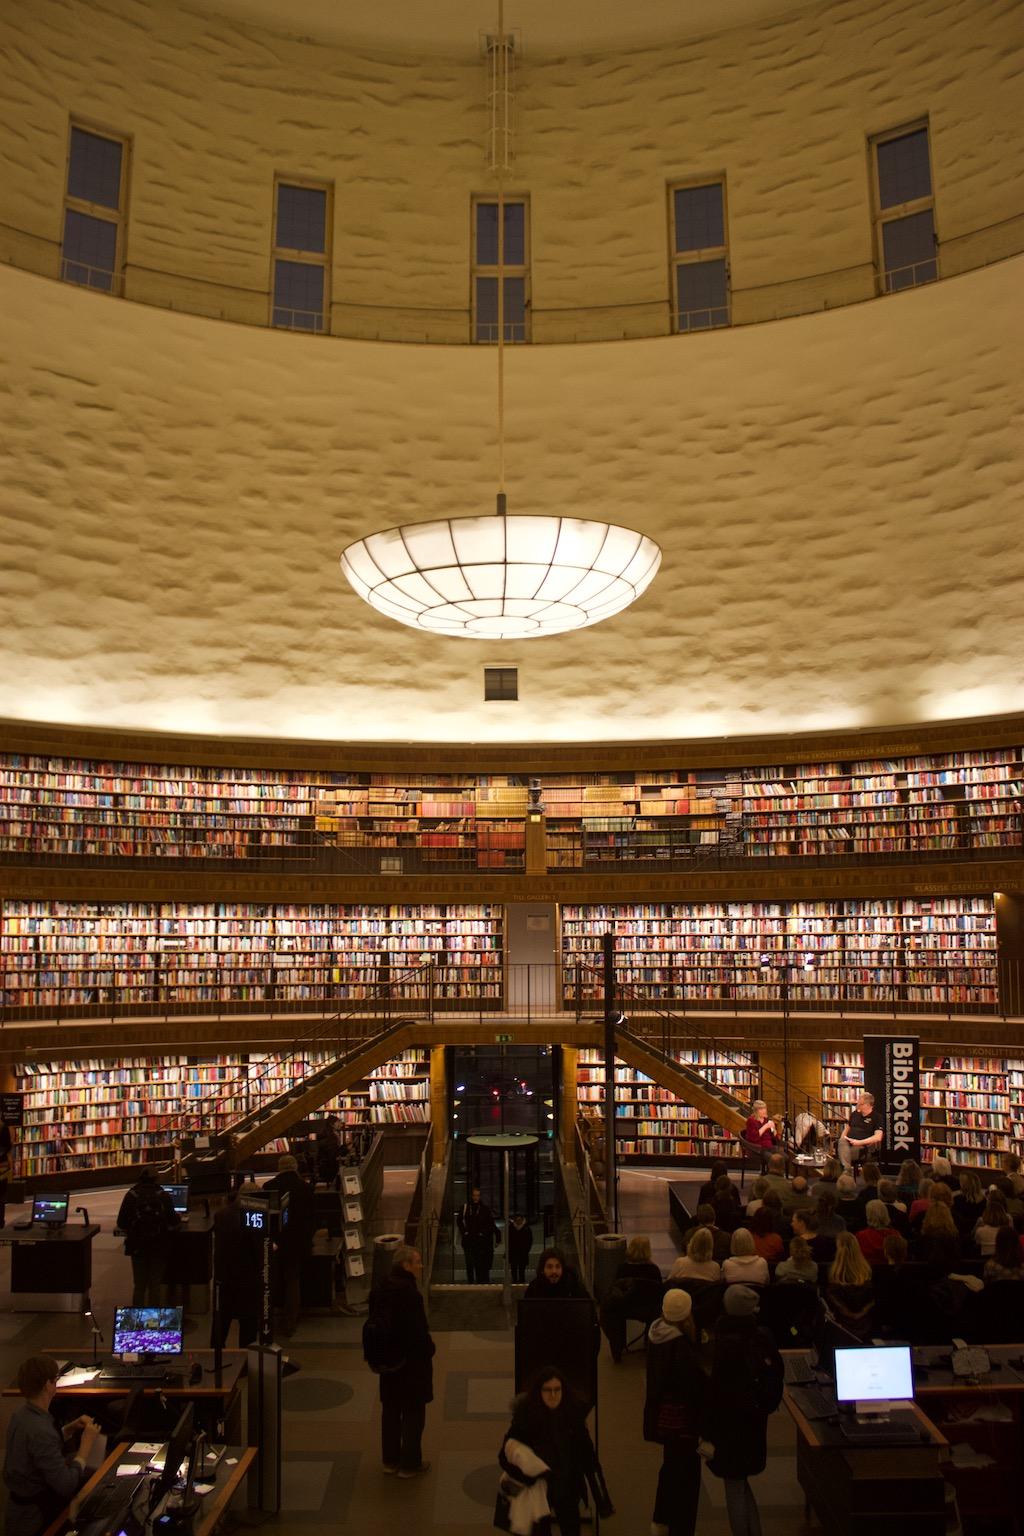 Stockholm Public Library - Rotunda and Windows